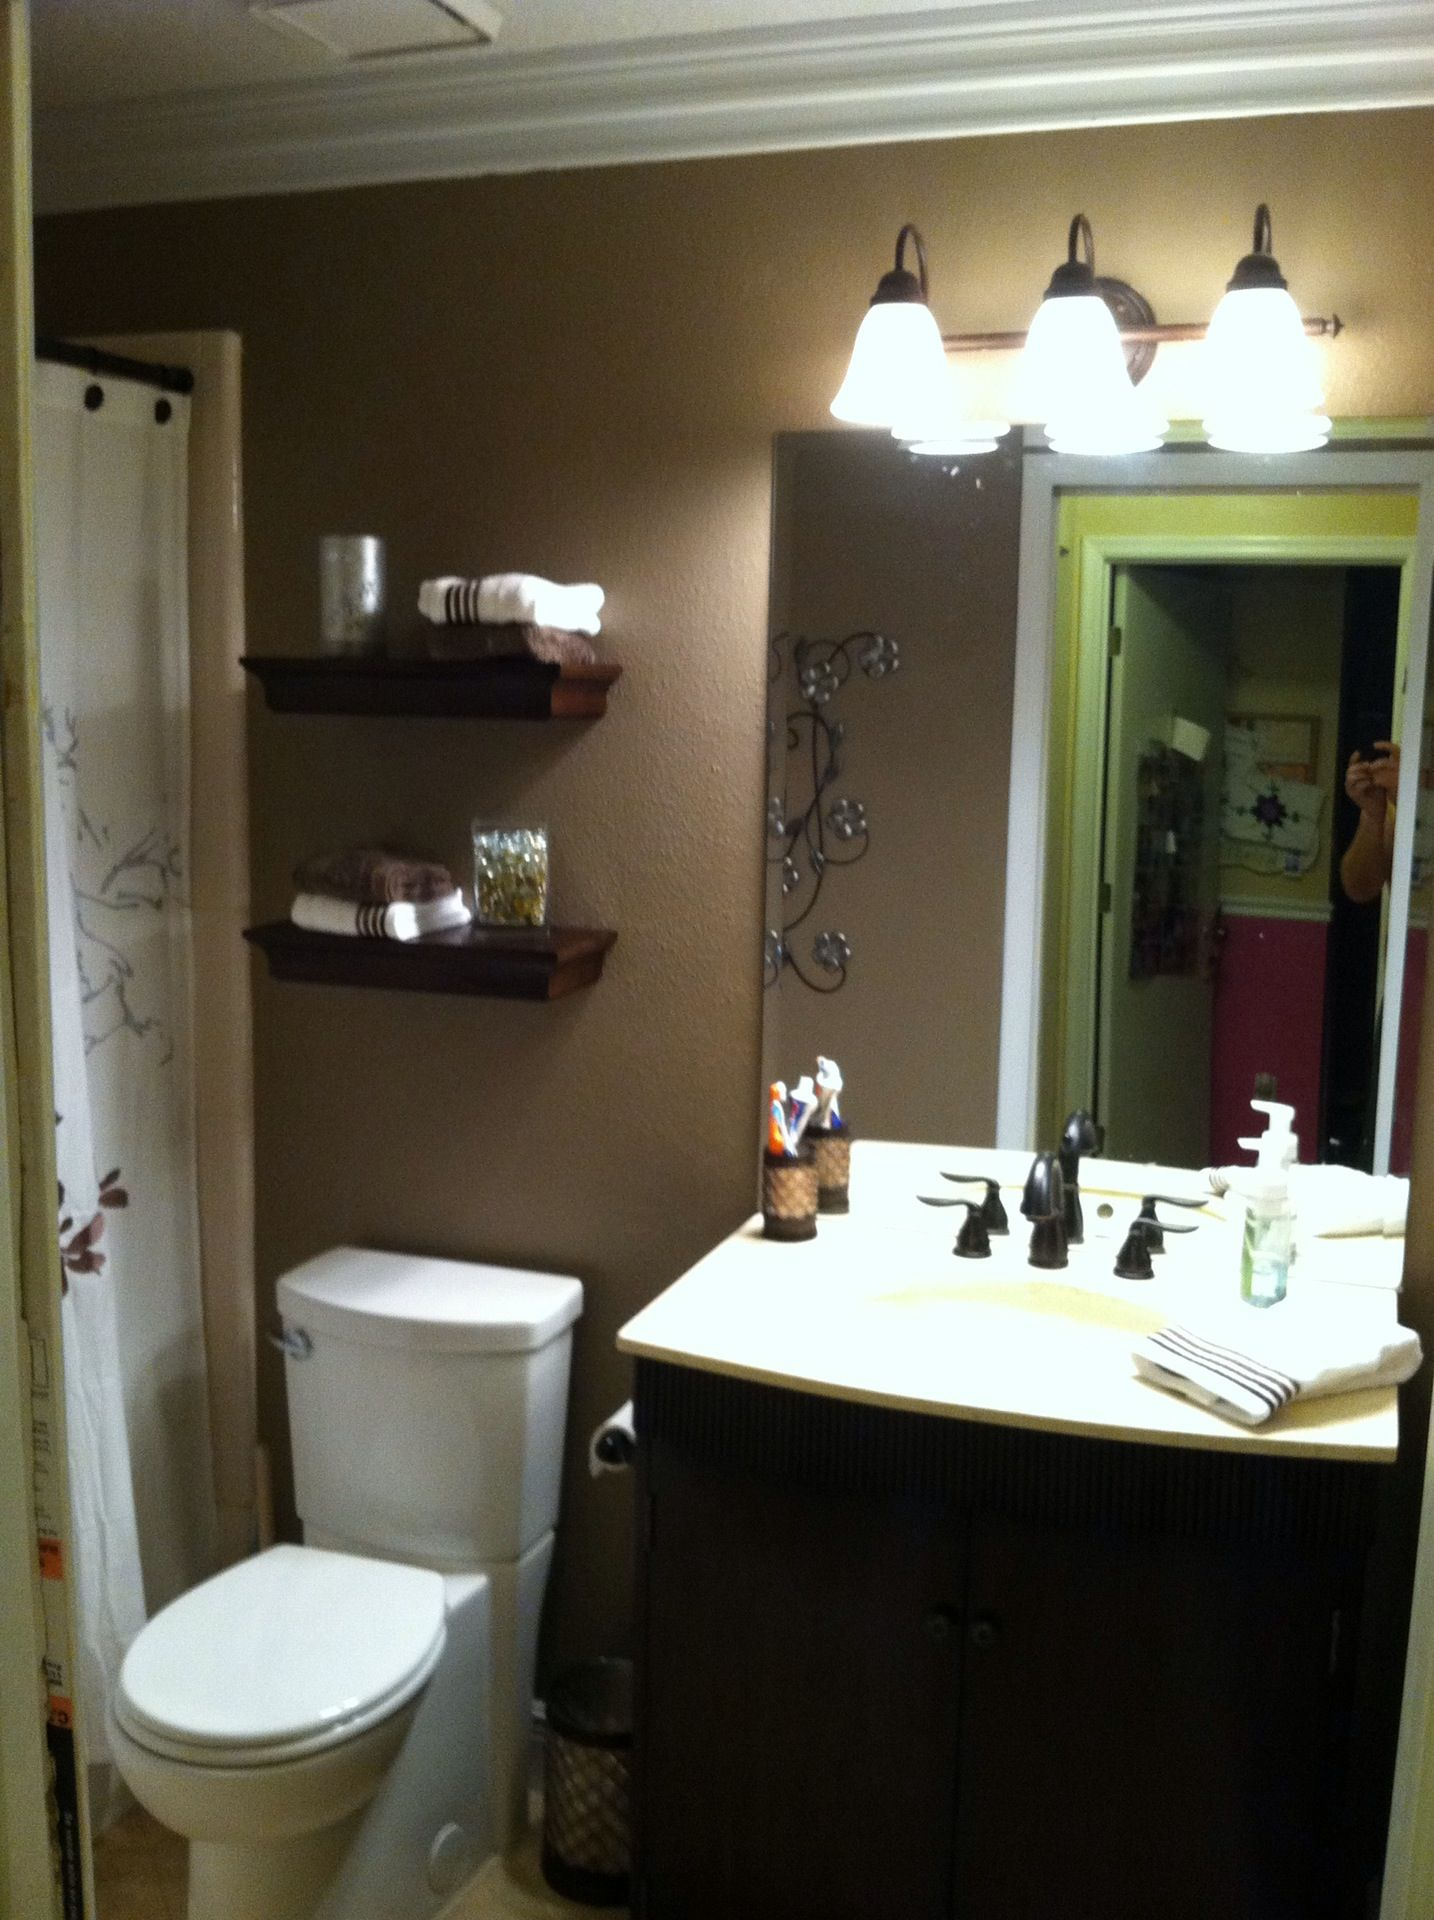 small bathroom remodel ideas | Bathroom Ideas | Pinterest on Small Bathroom Ideas Pinterest id=14756